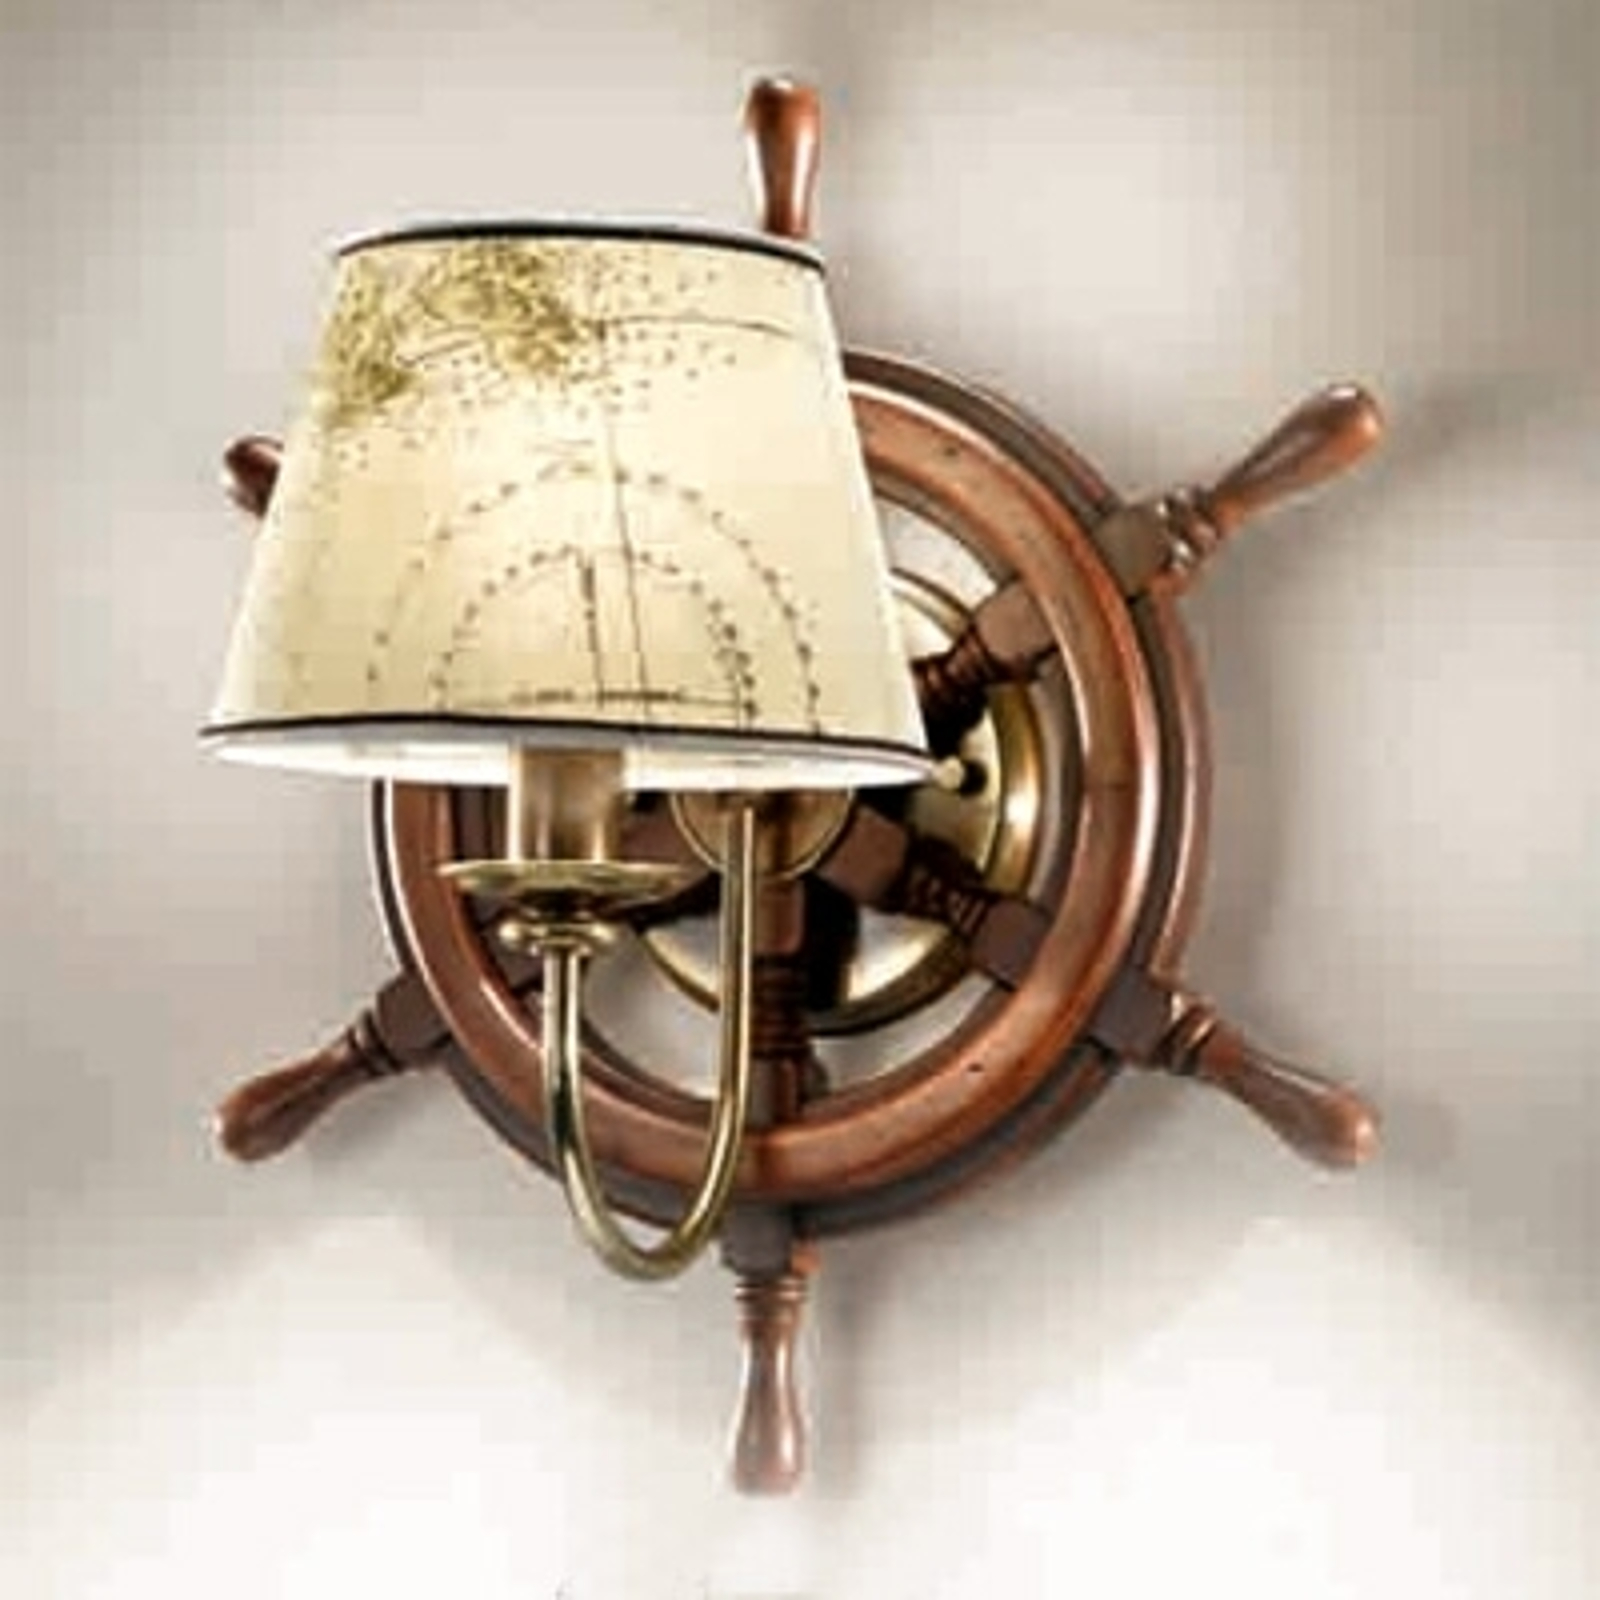 Interessant Porto væglampe, 1 lyskilde